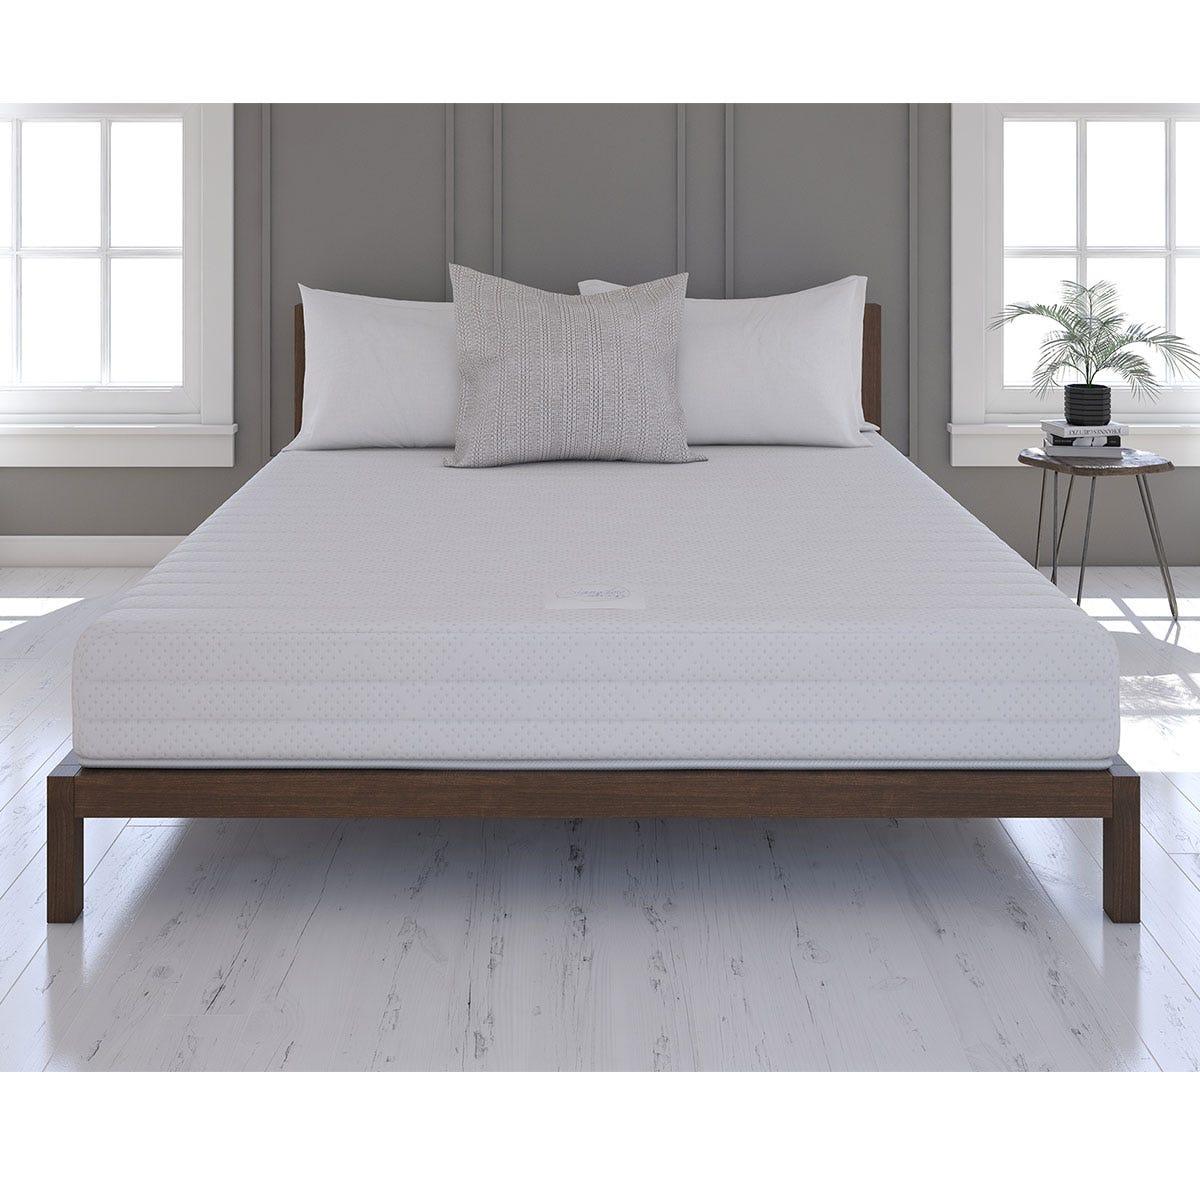 Signature Sleep Contour 8 Pocket Spring White Mattress - King